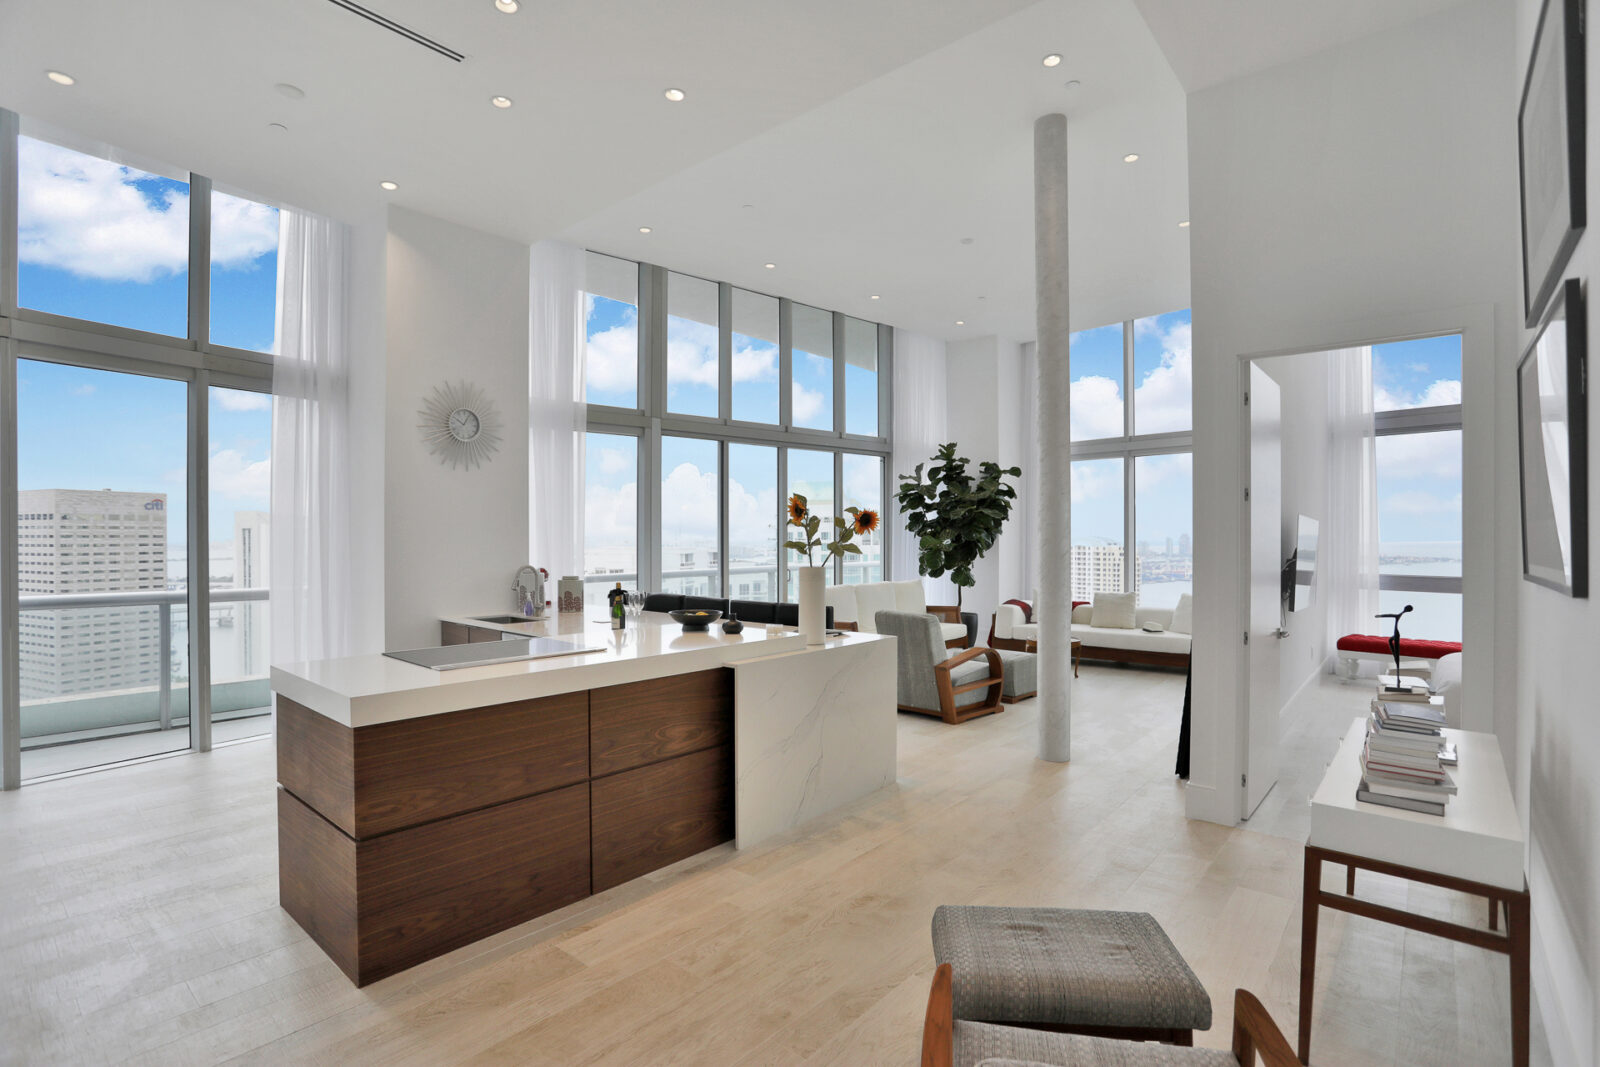 gut renovated 2 bedroom condo at Icon Brickell